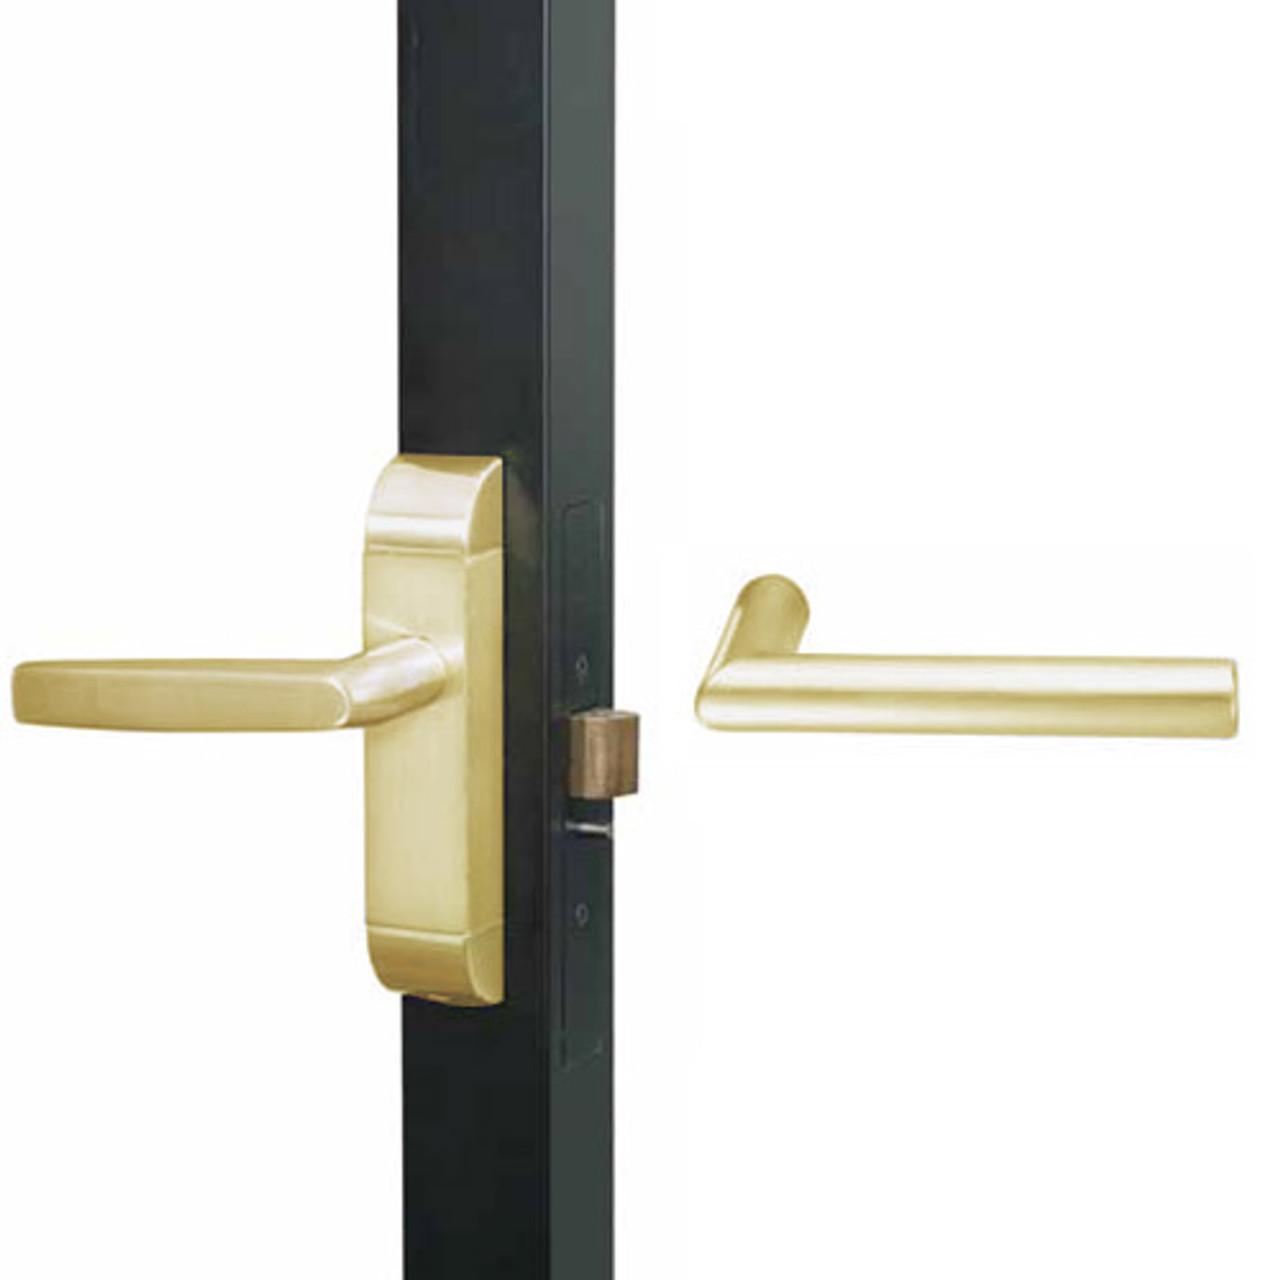 4600-MI-531-US4 Adams Rite MI Designer Deadlatch handle in Satin Brass Finish